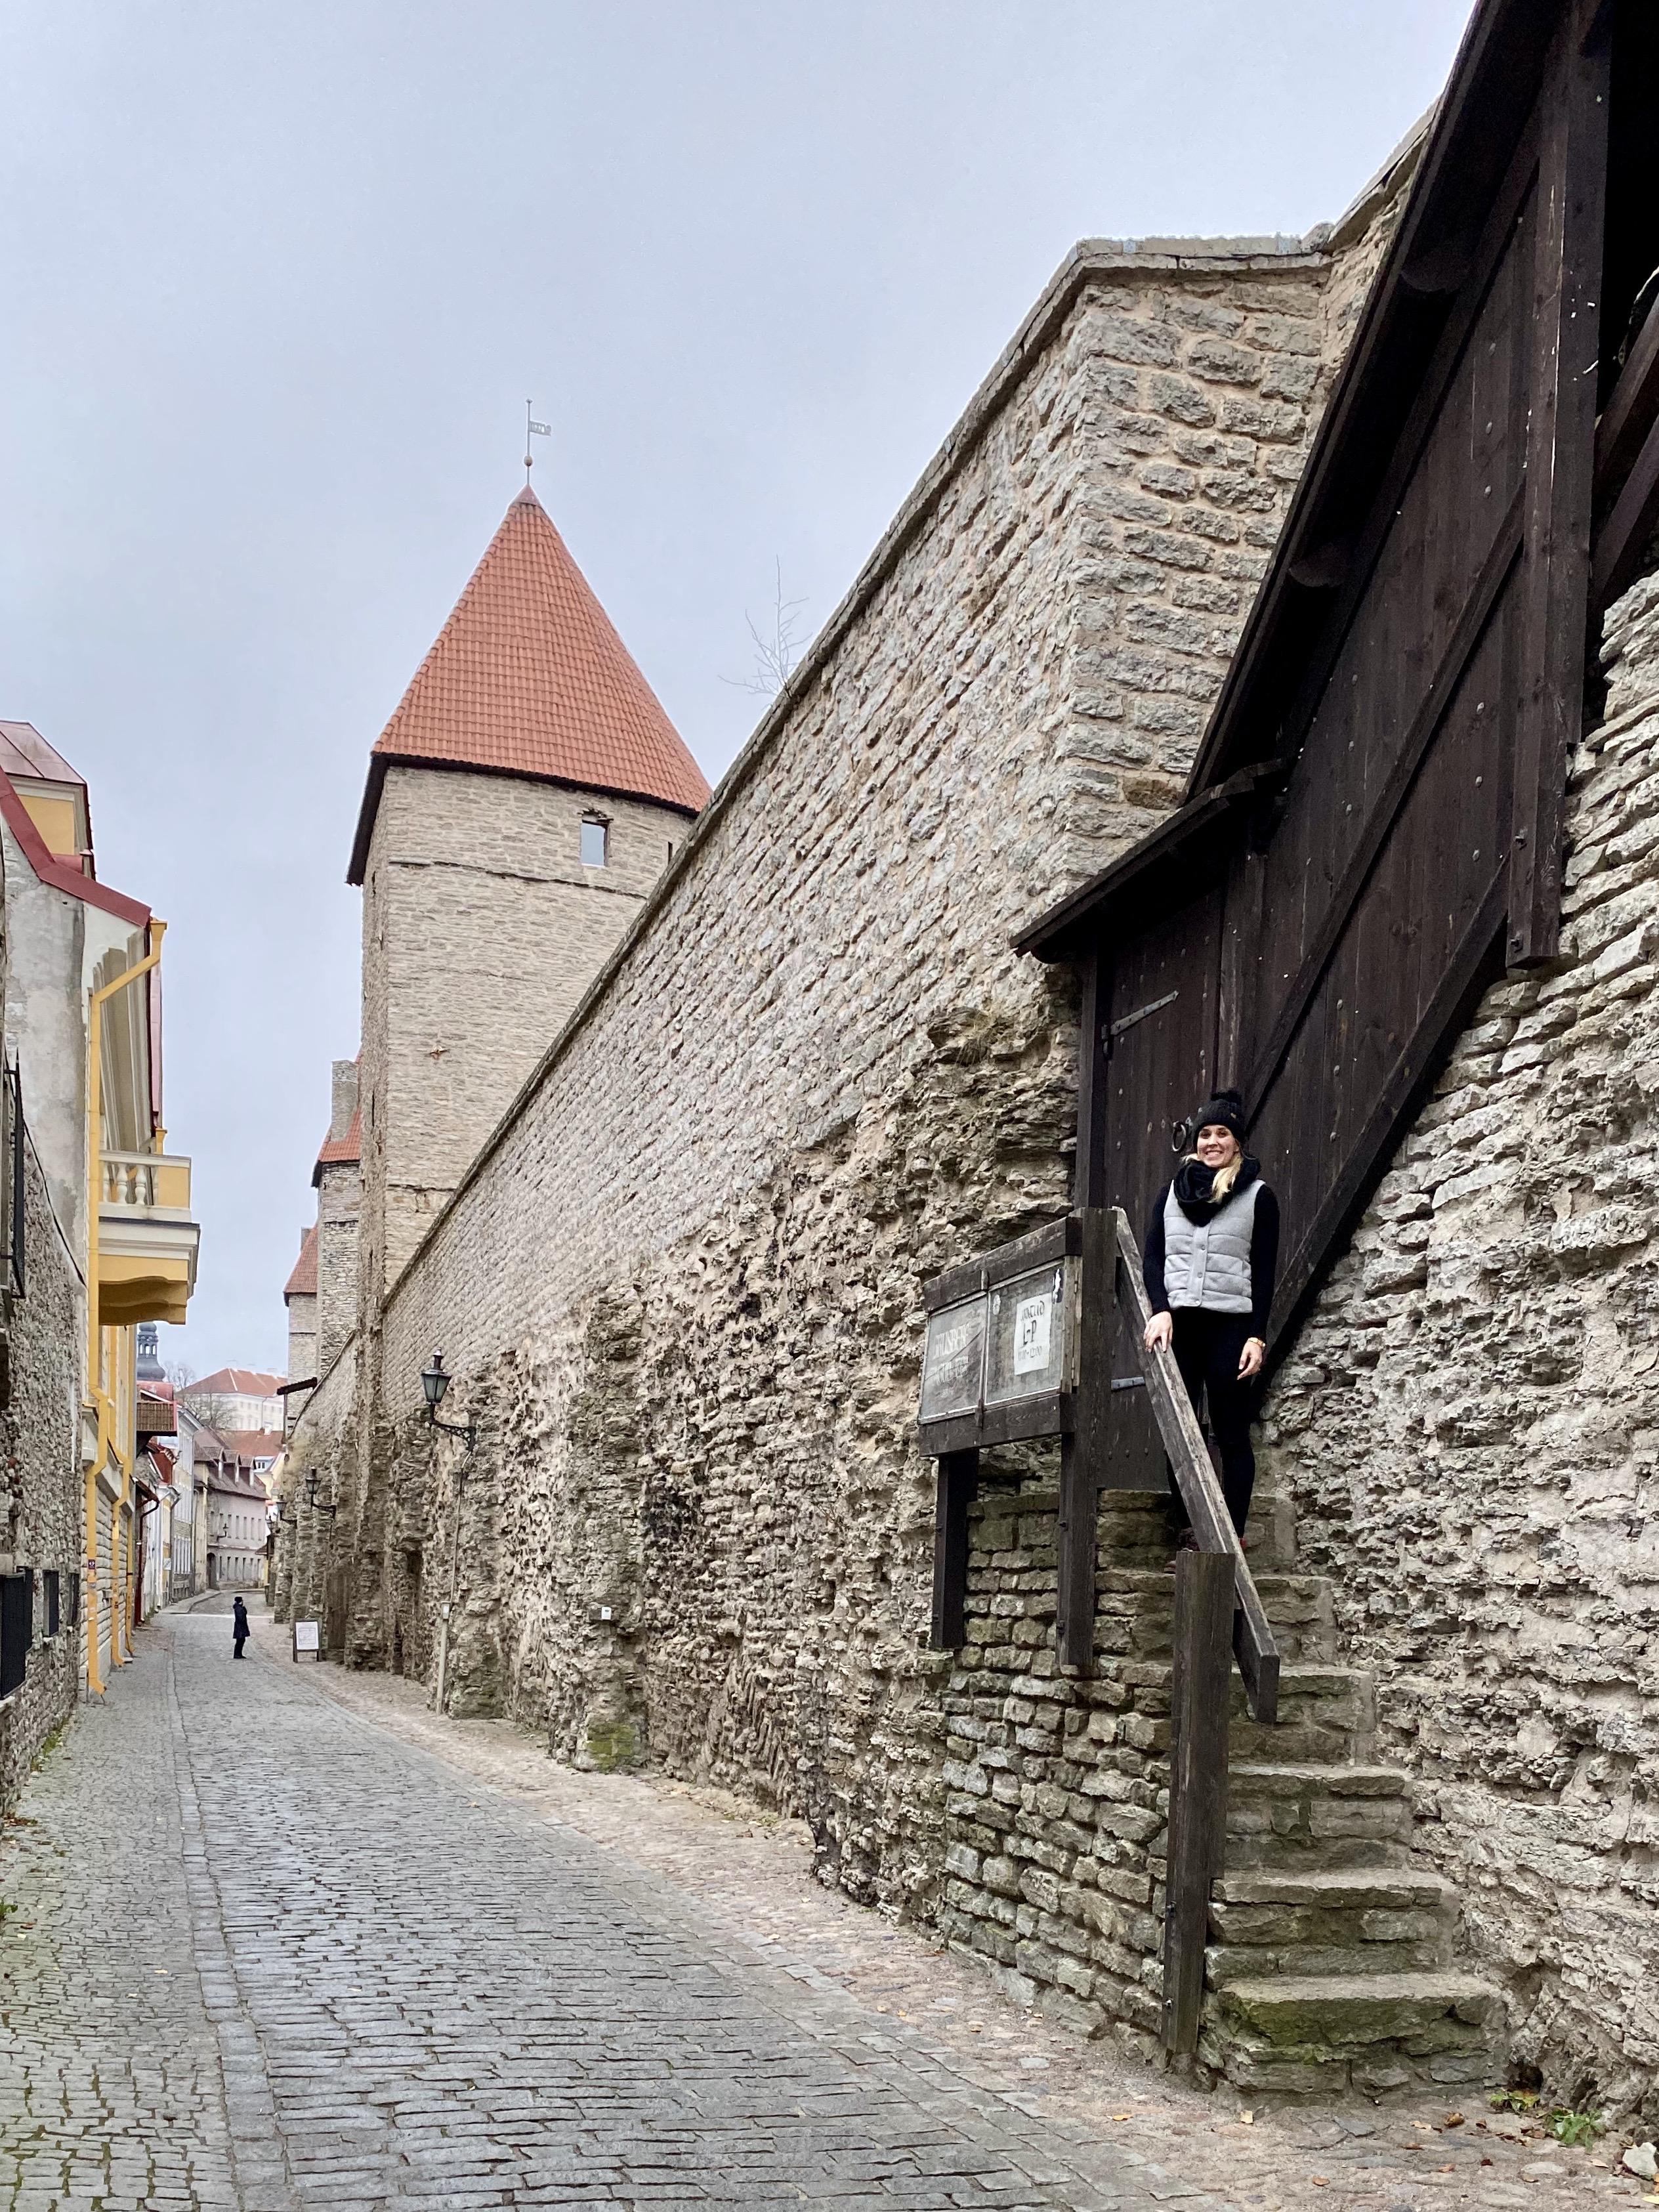 Erinn standing alongside the medieval city walls of Tallinn, Estonia.